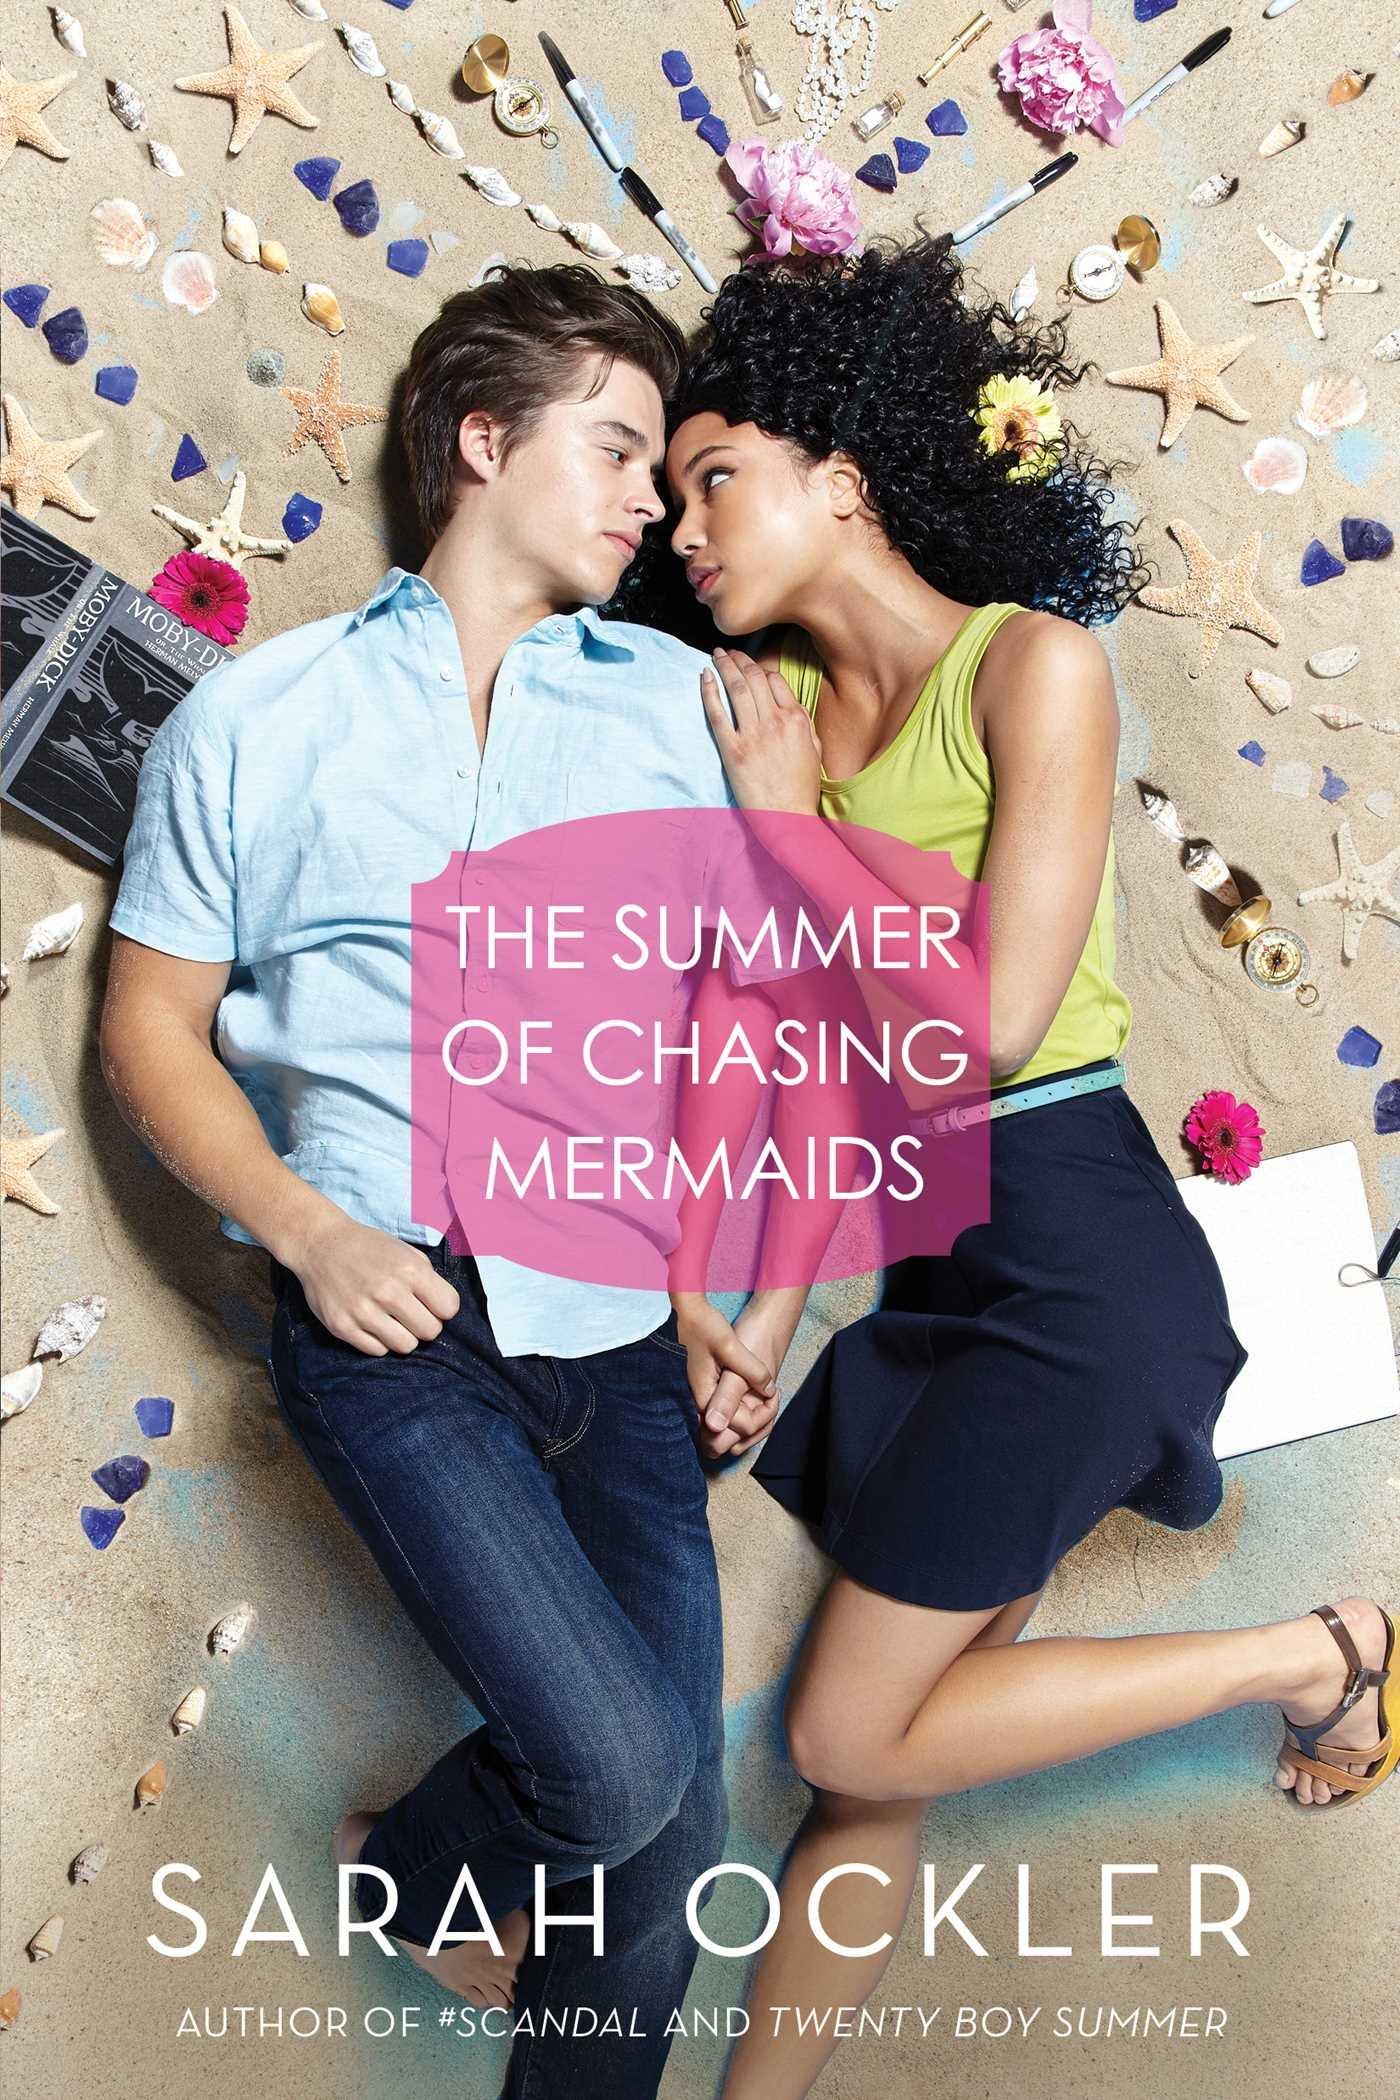 Amazon: The Summer Of Chasing Mermaids (9781481401289): Sarah Ockler:  Books